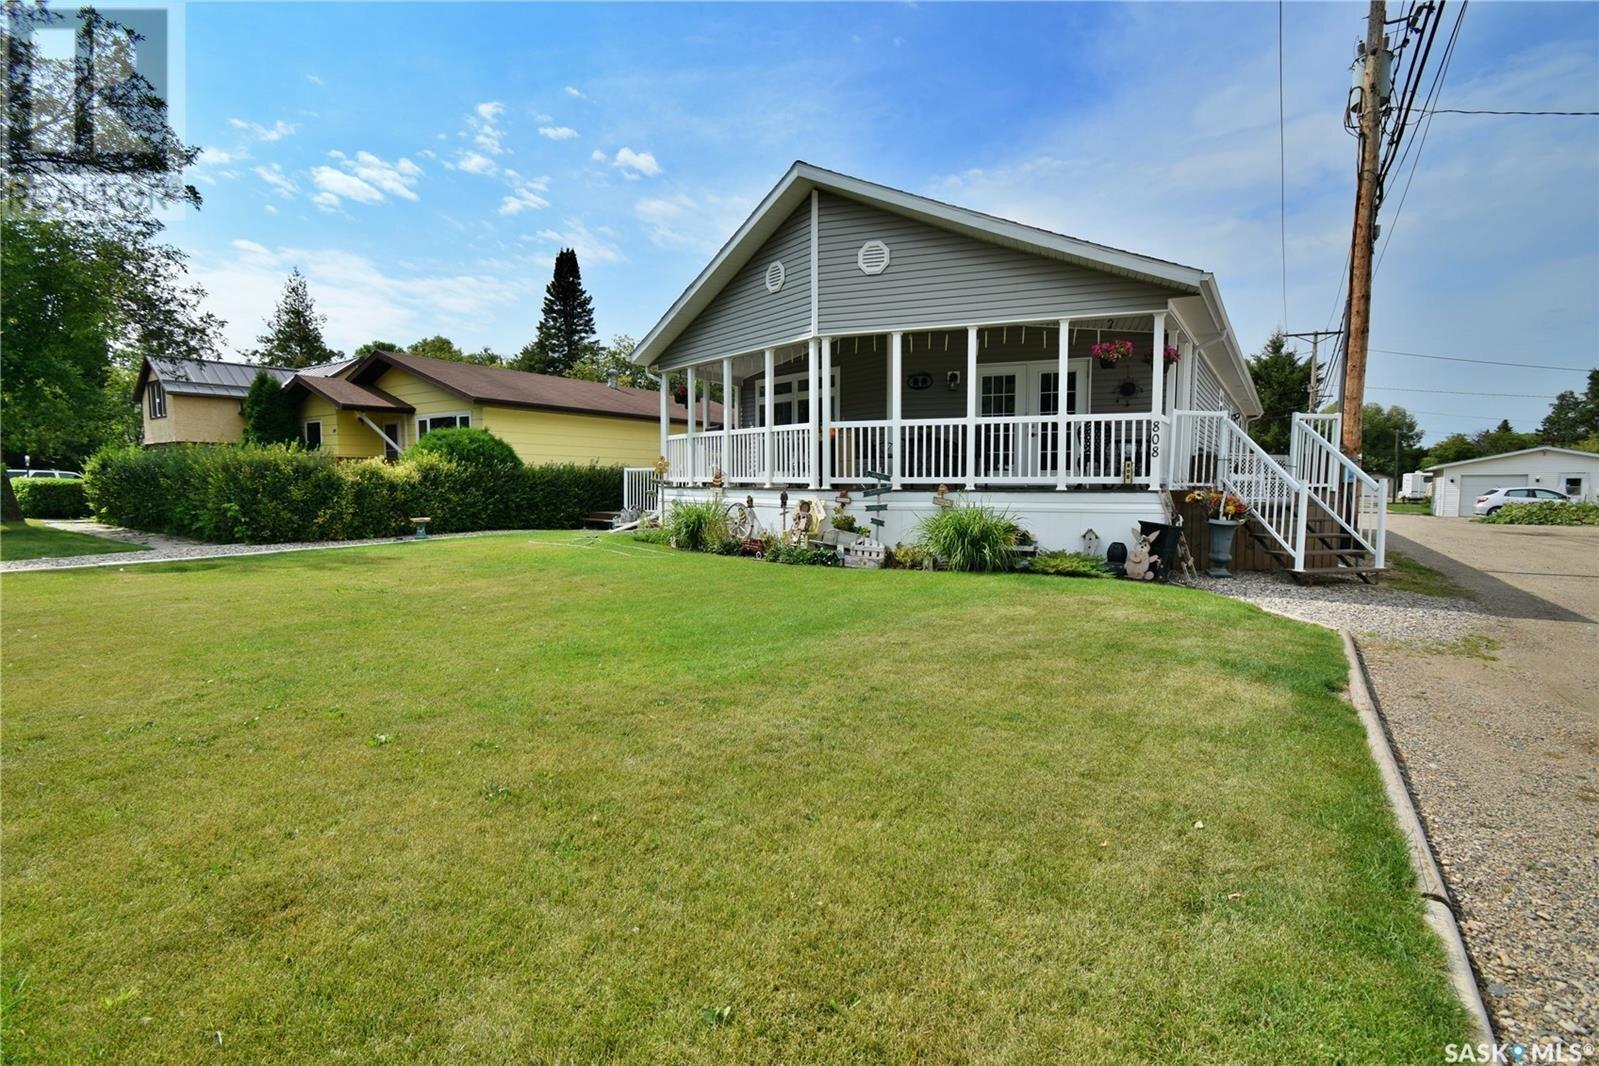 Residential property for sale at 808 Moose St Moosomin Saskatchewan - MLS: SK823883